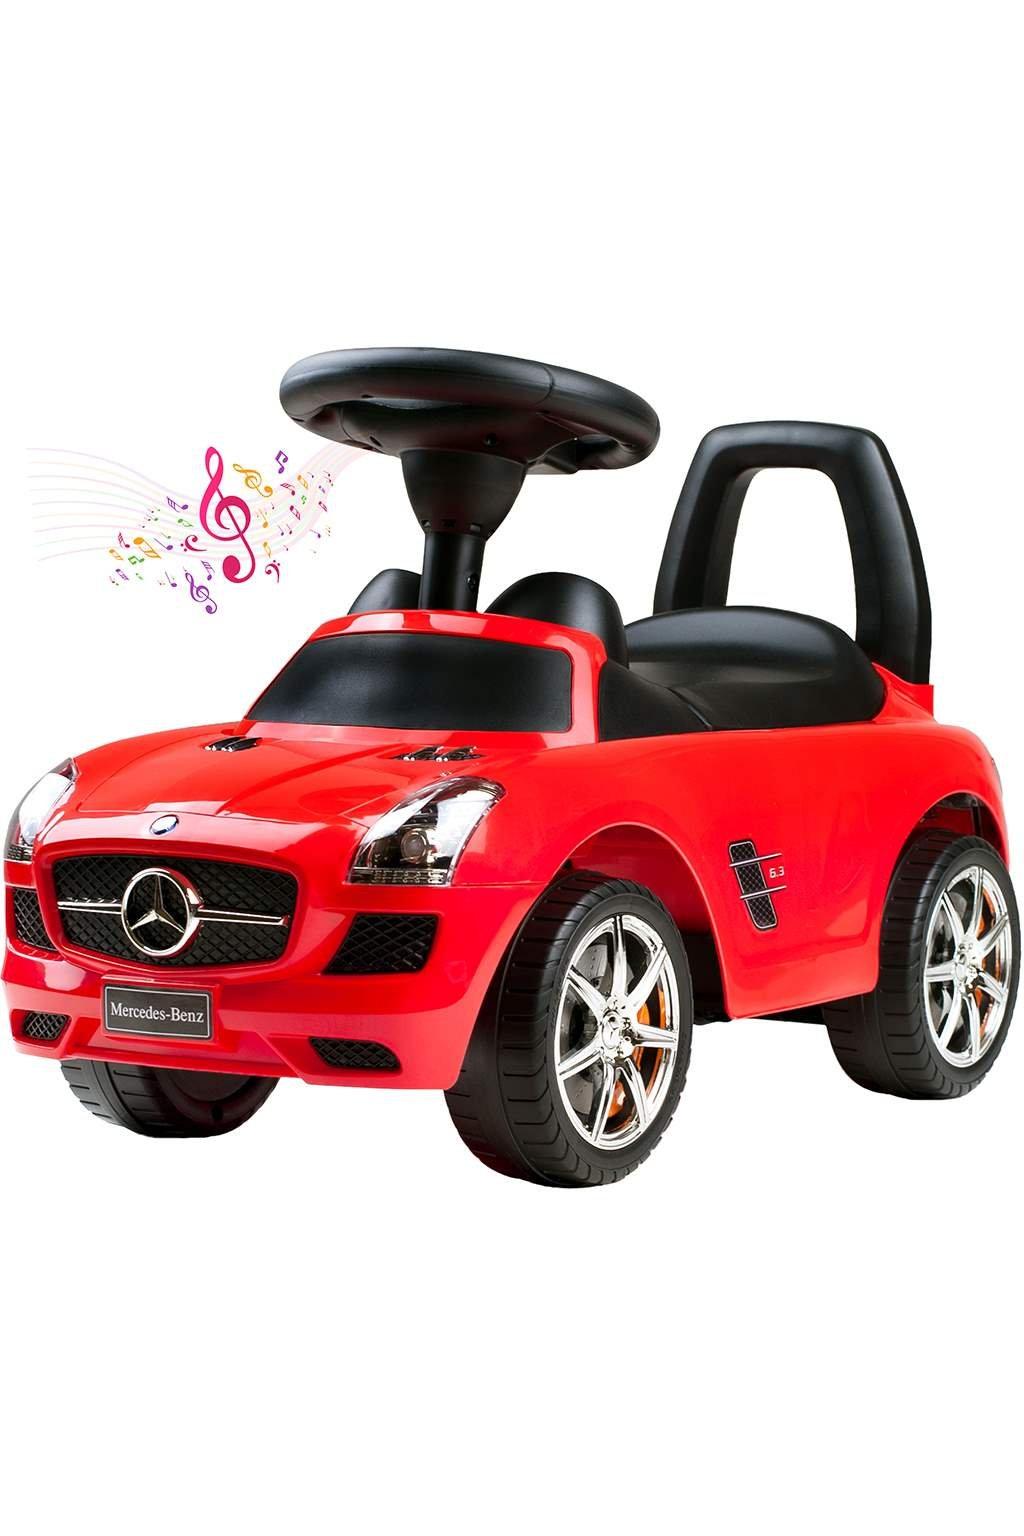 Detské jazdítko-odrážadlo Bayo Mercedes-Benz red